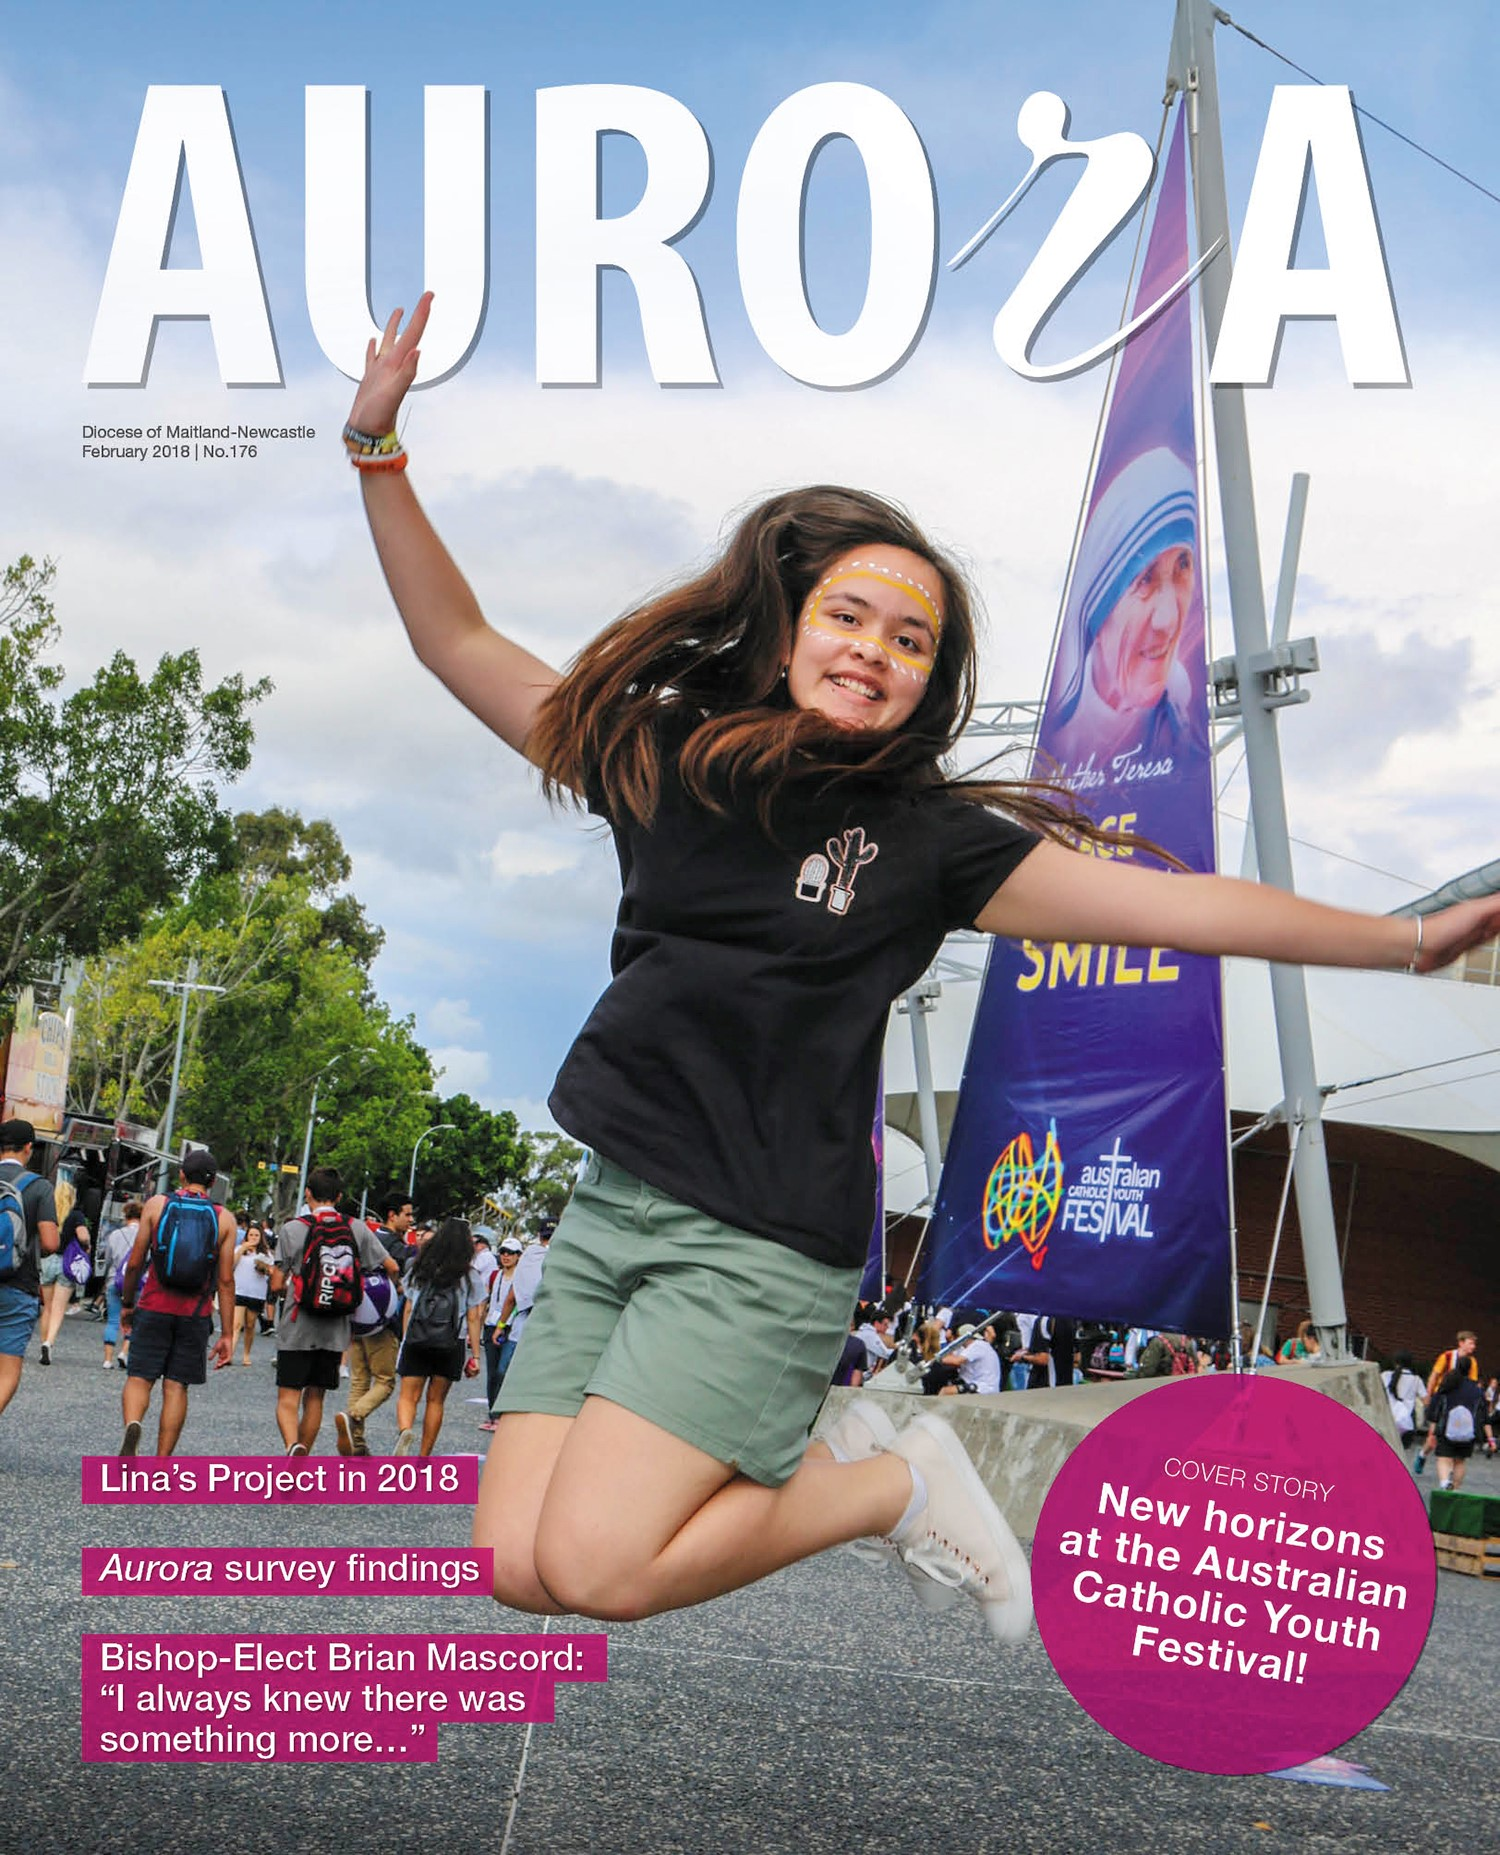 Aurora February 2018 Cover Image